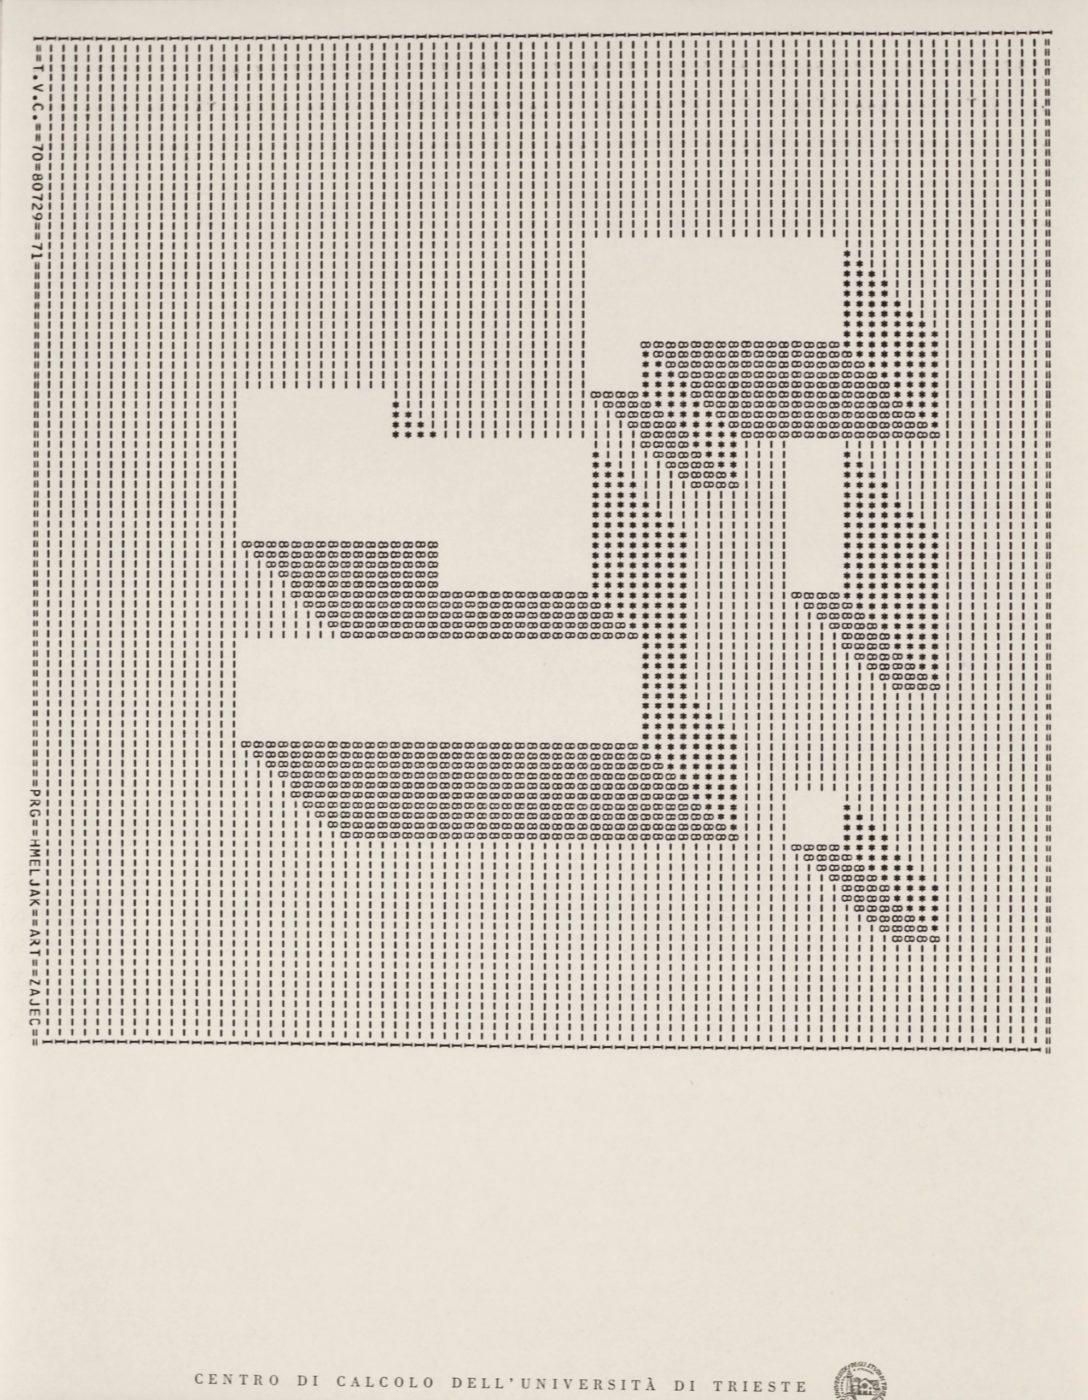 Edward Zajec, T.V.C. 70, plotter drawing, ink on paper, 40 x 28, 1971